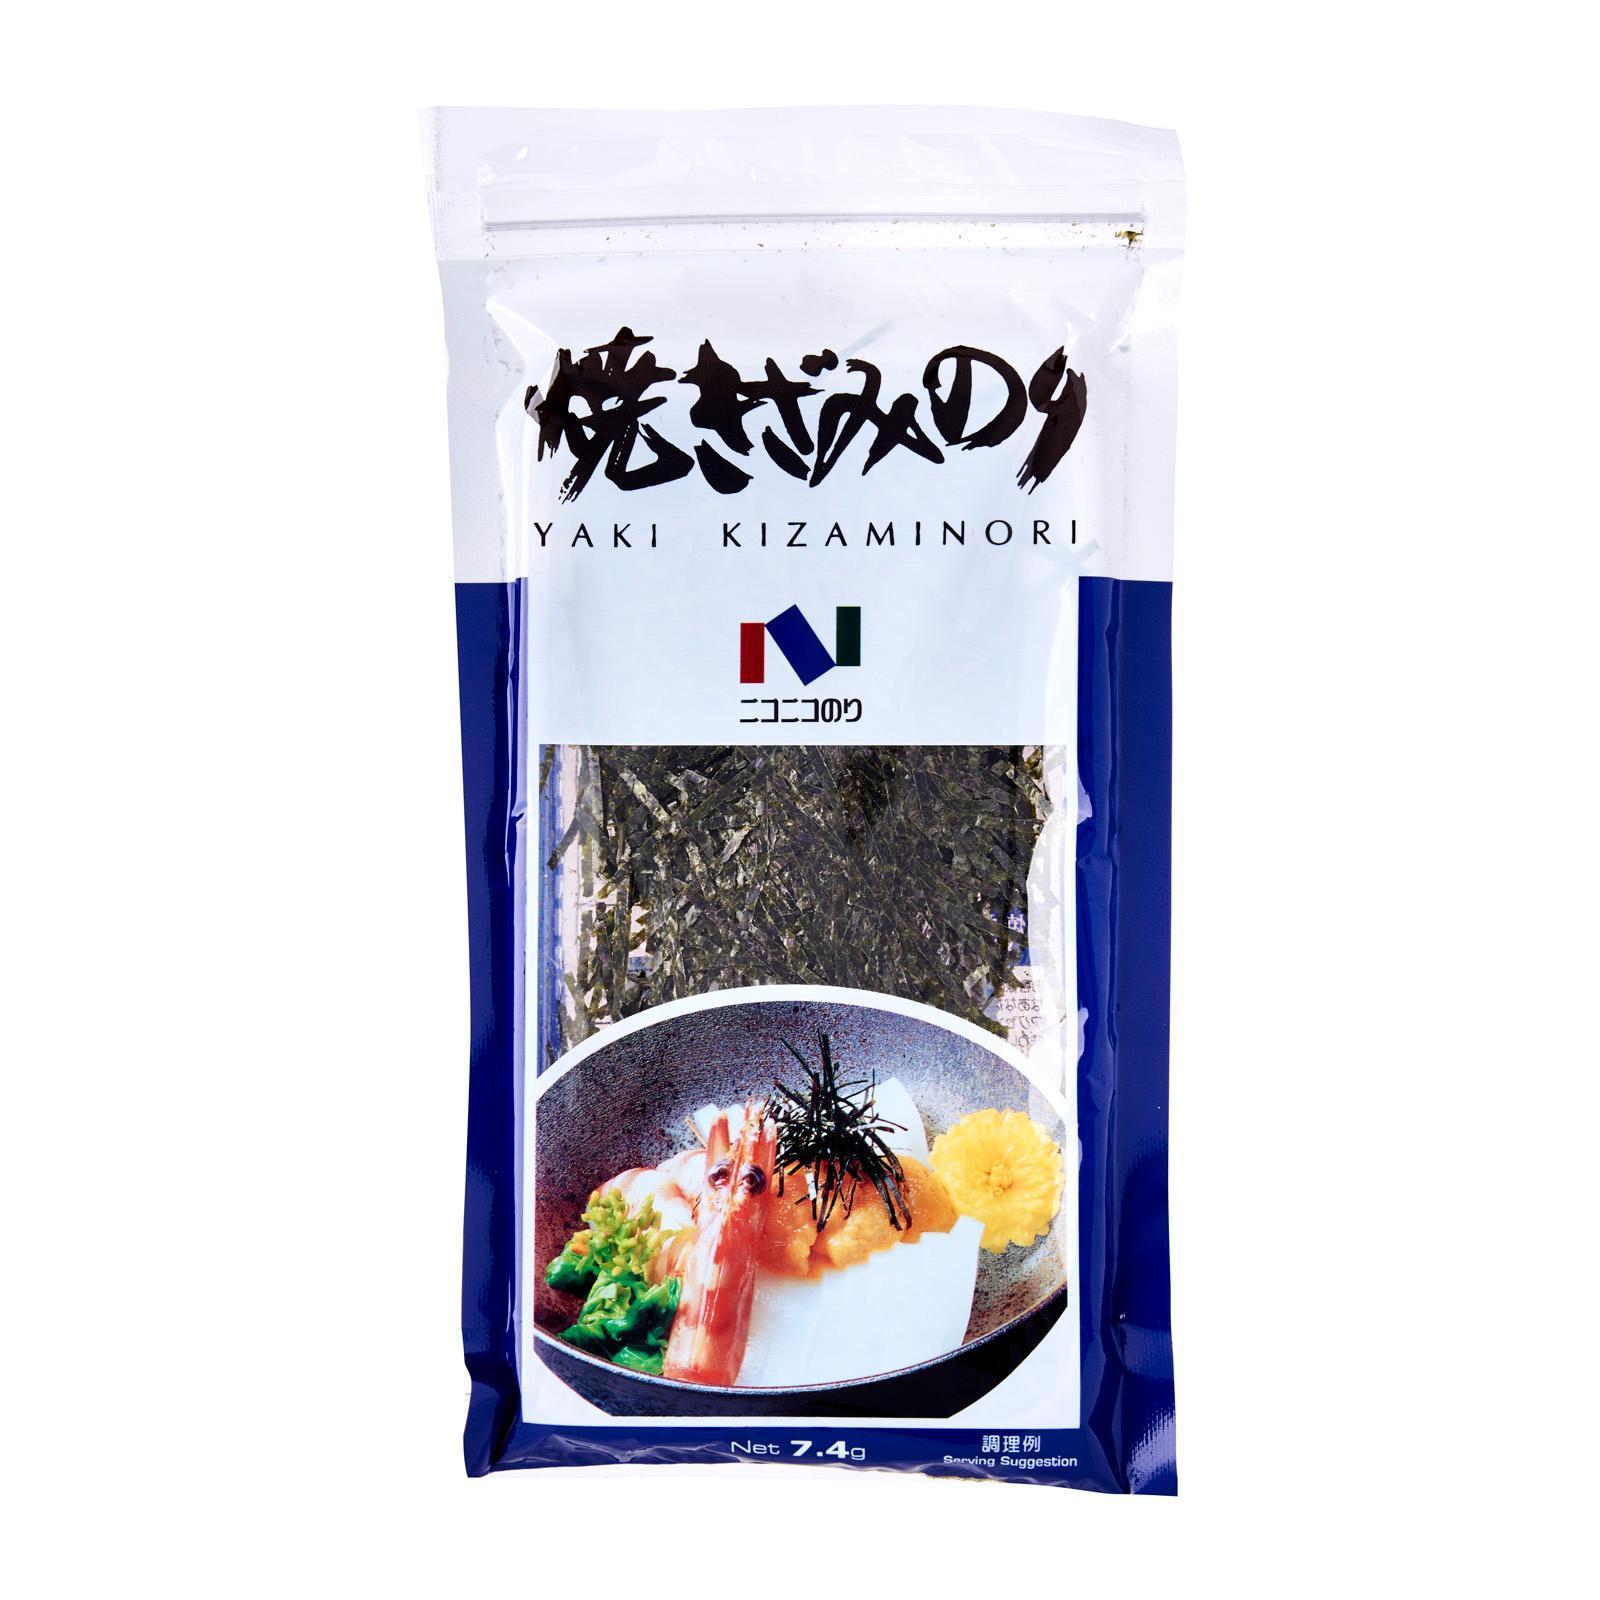 Kirei Yaki Kizami Nori Roasted Seaweed strips 7.4 G